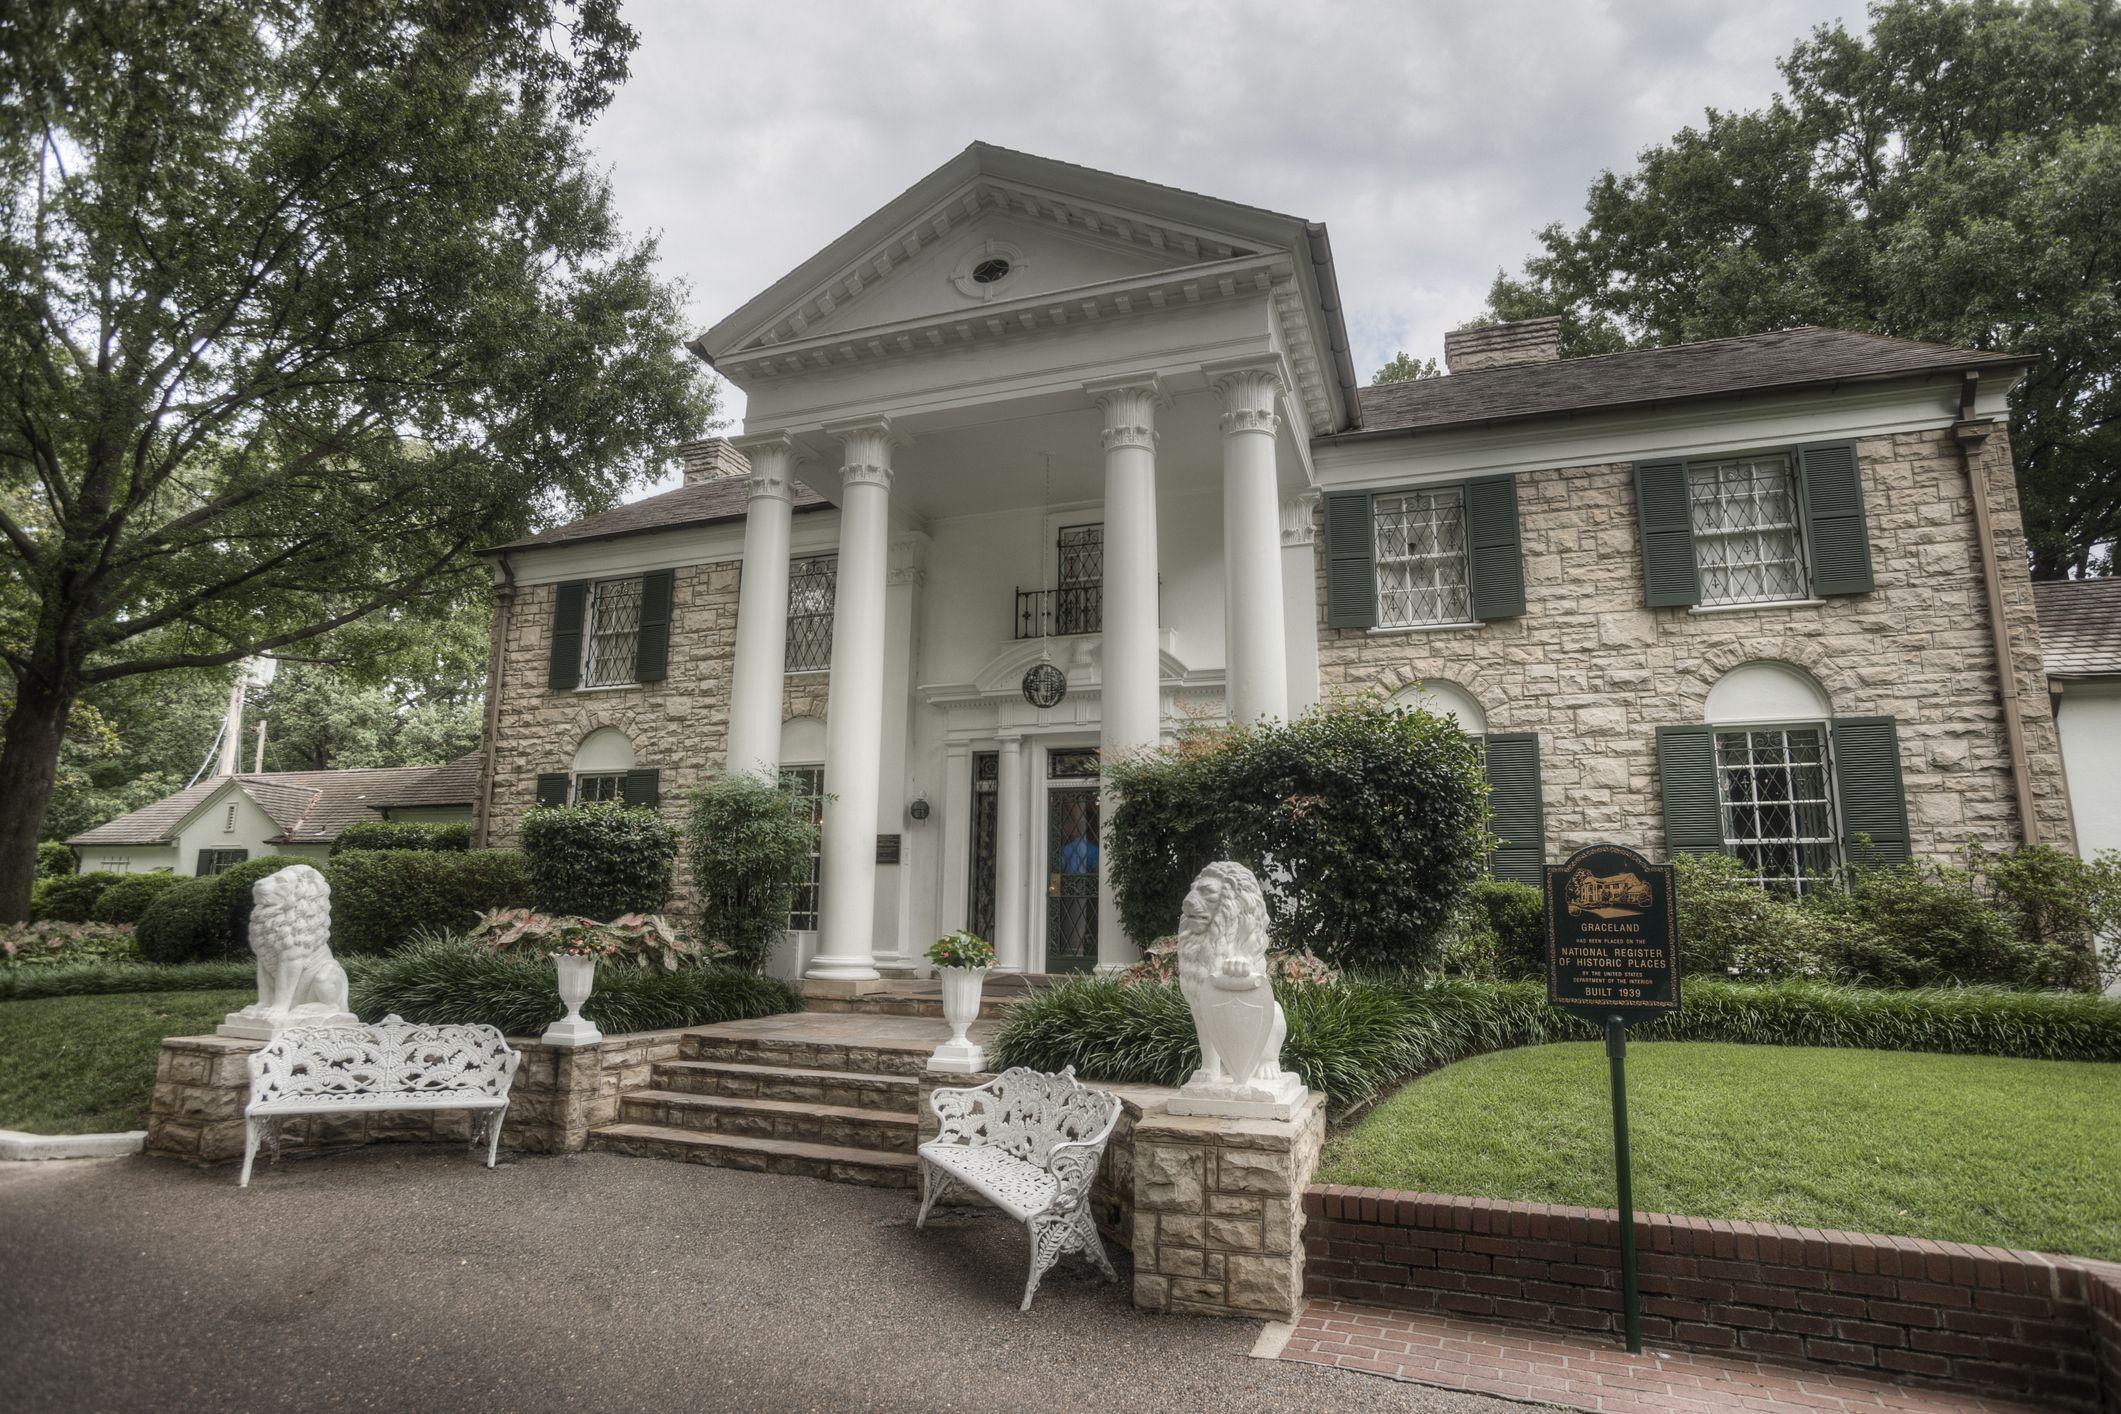 Elvis Presley's House, Graceland Mansion Facts - Graceland Hours, Tours, and More